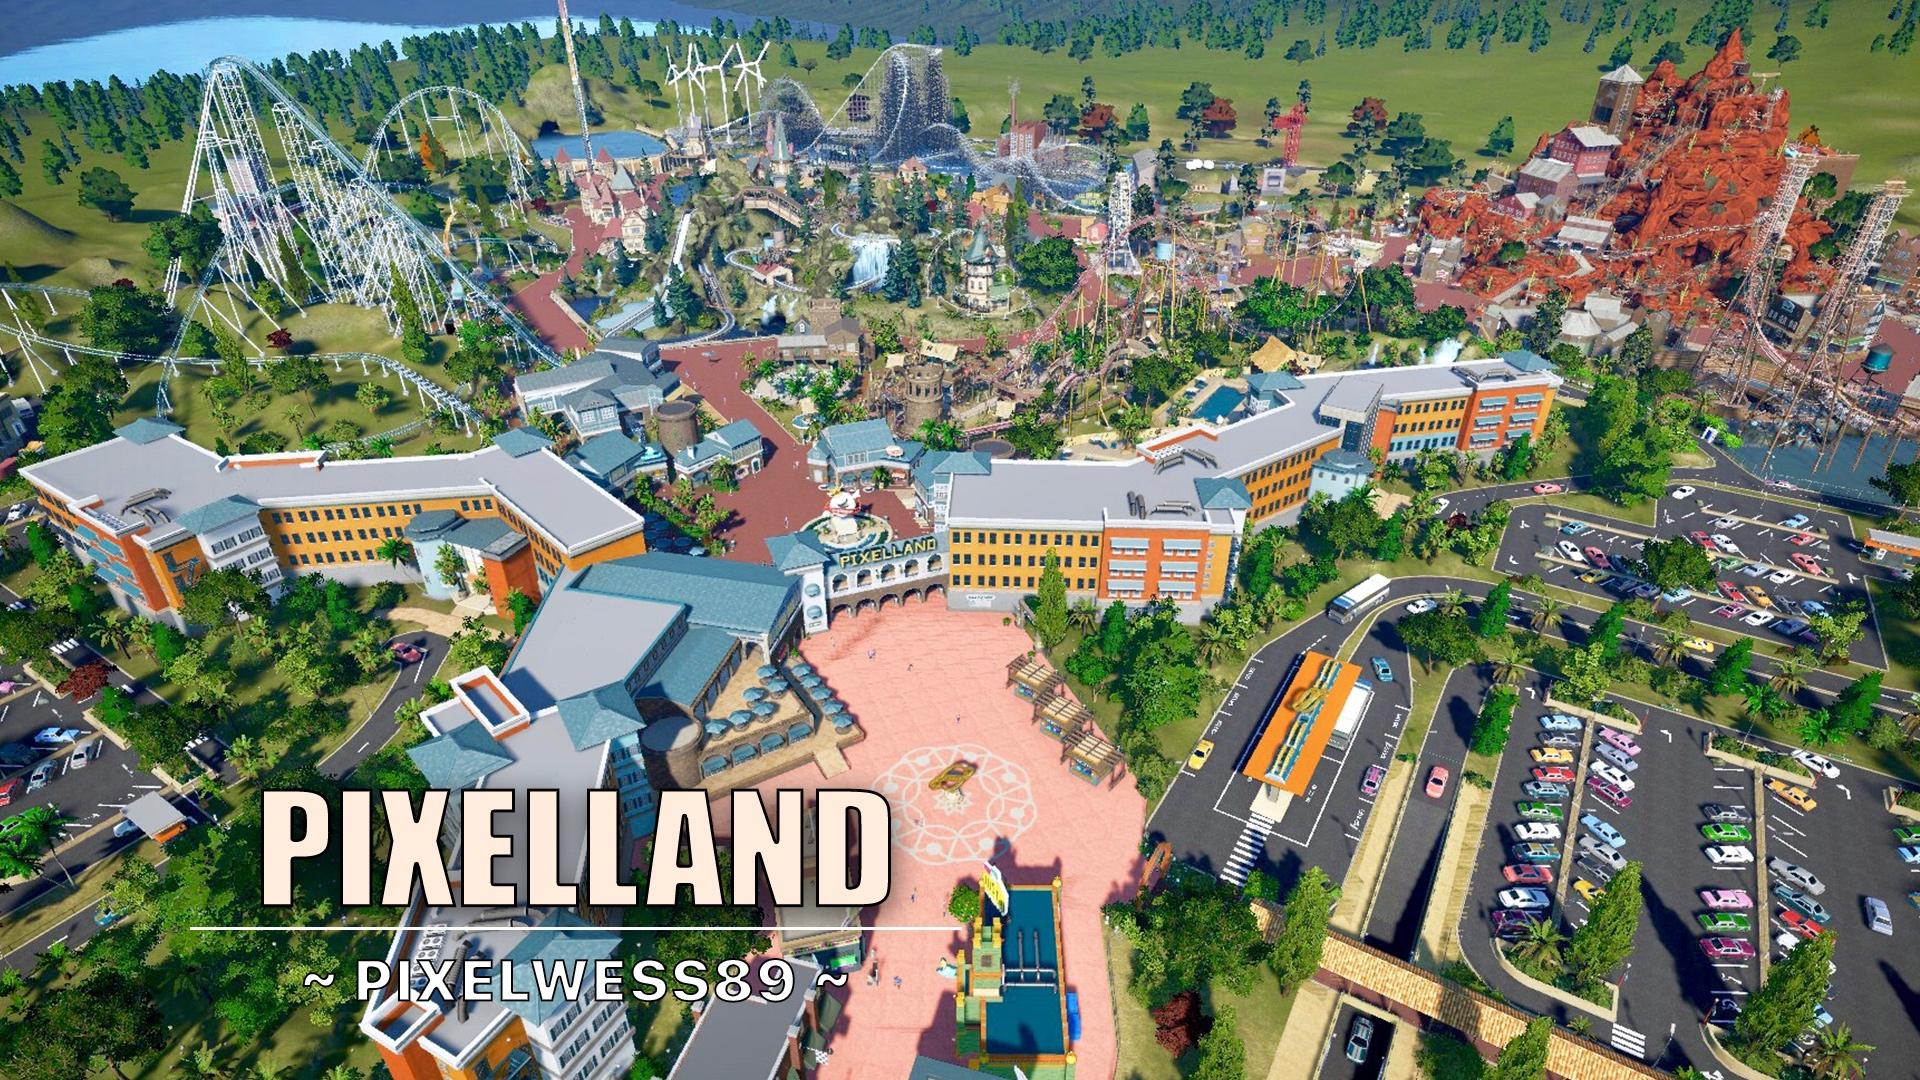 New video: Pixelland 🎢🎡🎠 [mega theme park]